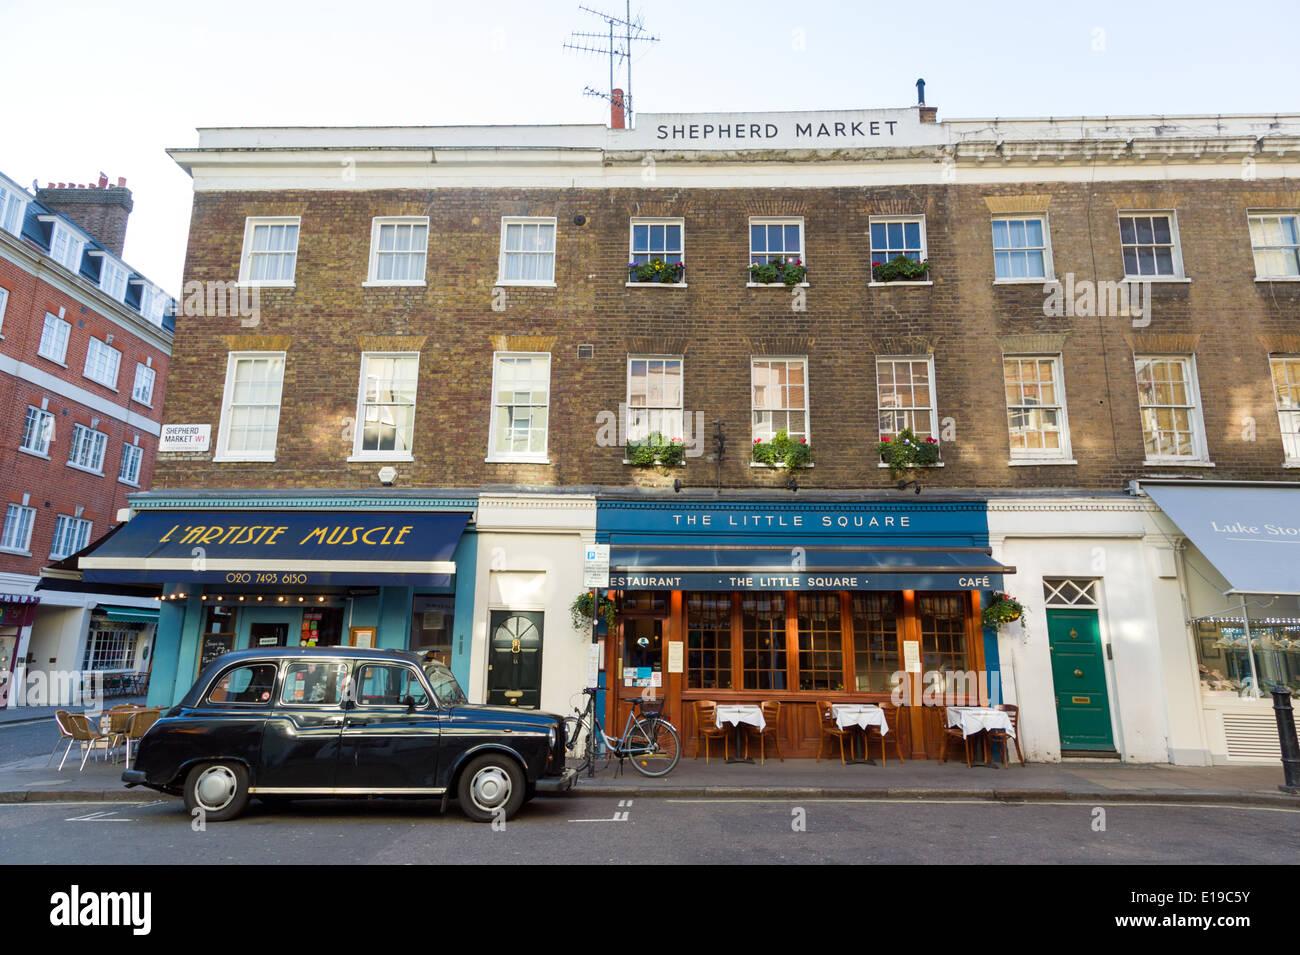 Shepherd Market, Mayfair, London, UK - Stock Image